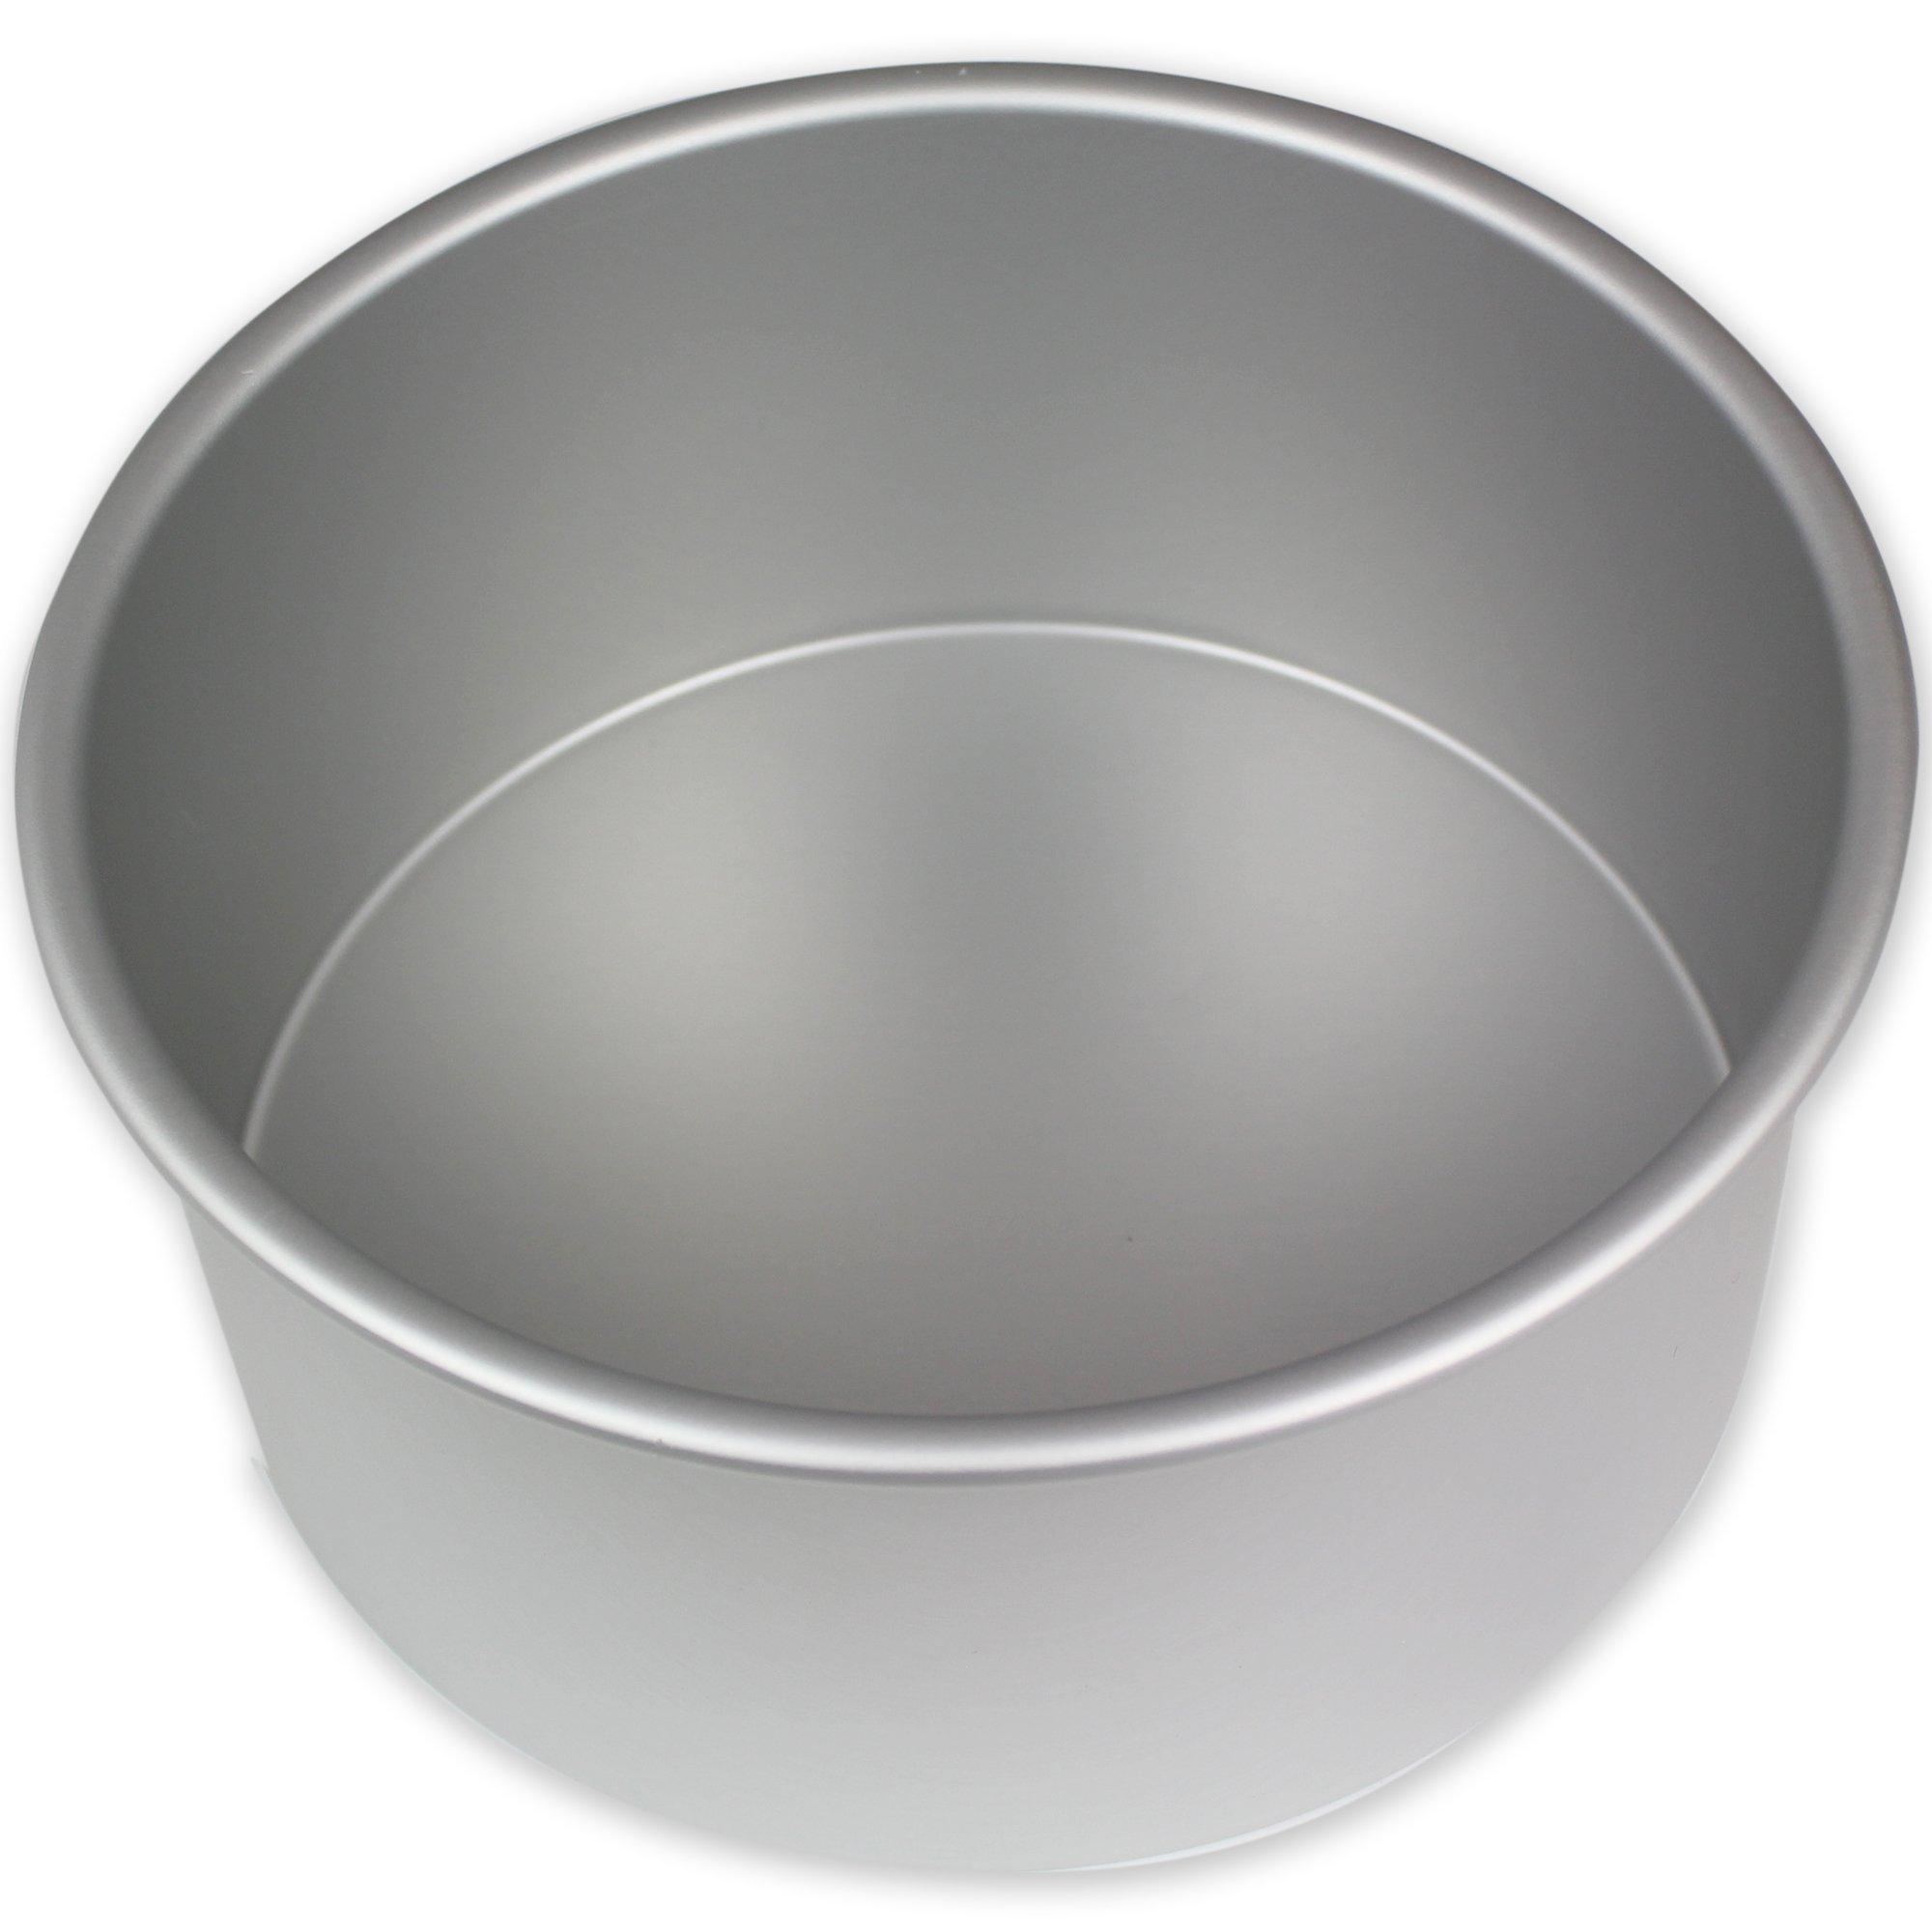 PME RND084 Round Seamless Professional Aluminum Baking Pan, 8'' x 4'', Silver